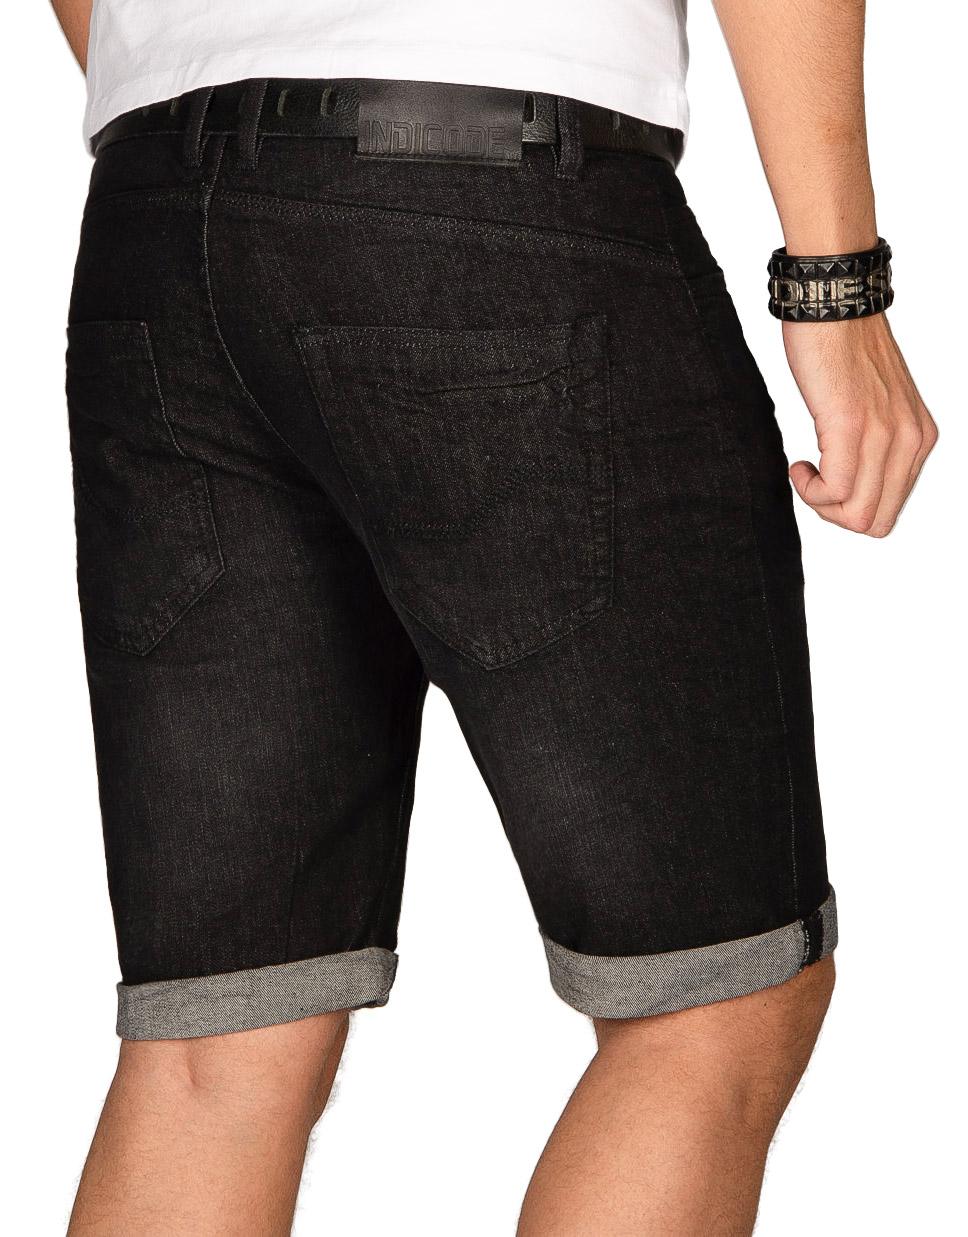 Indicode-Herren-Sommer-Bermuda-Jeans-Shorts-kurze-Hose-Sommerhose-Short-Neu-B556 Indexbild 4